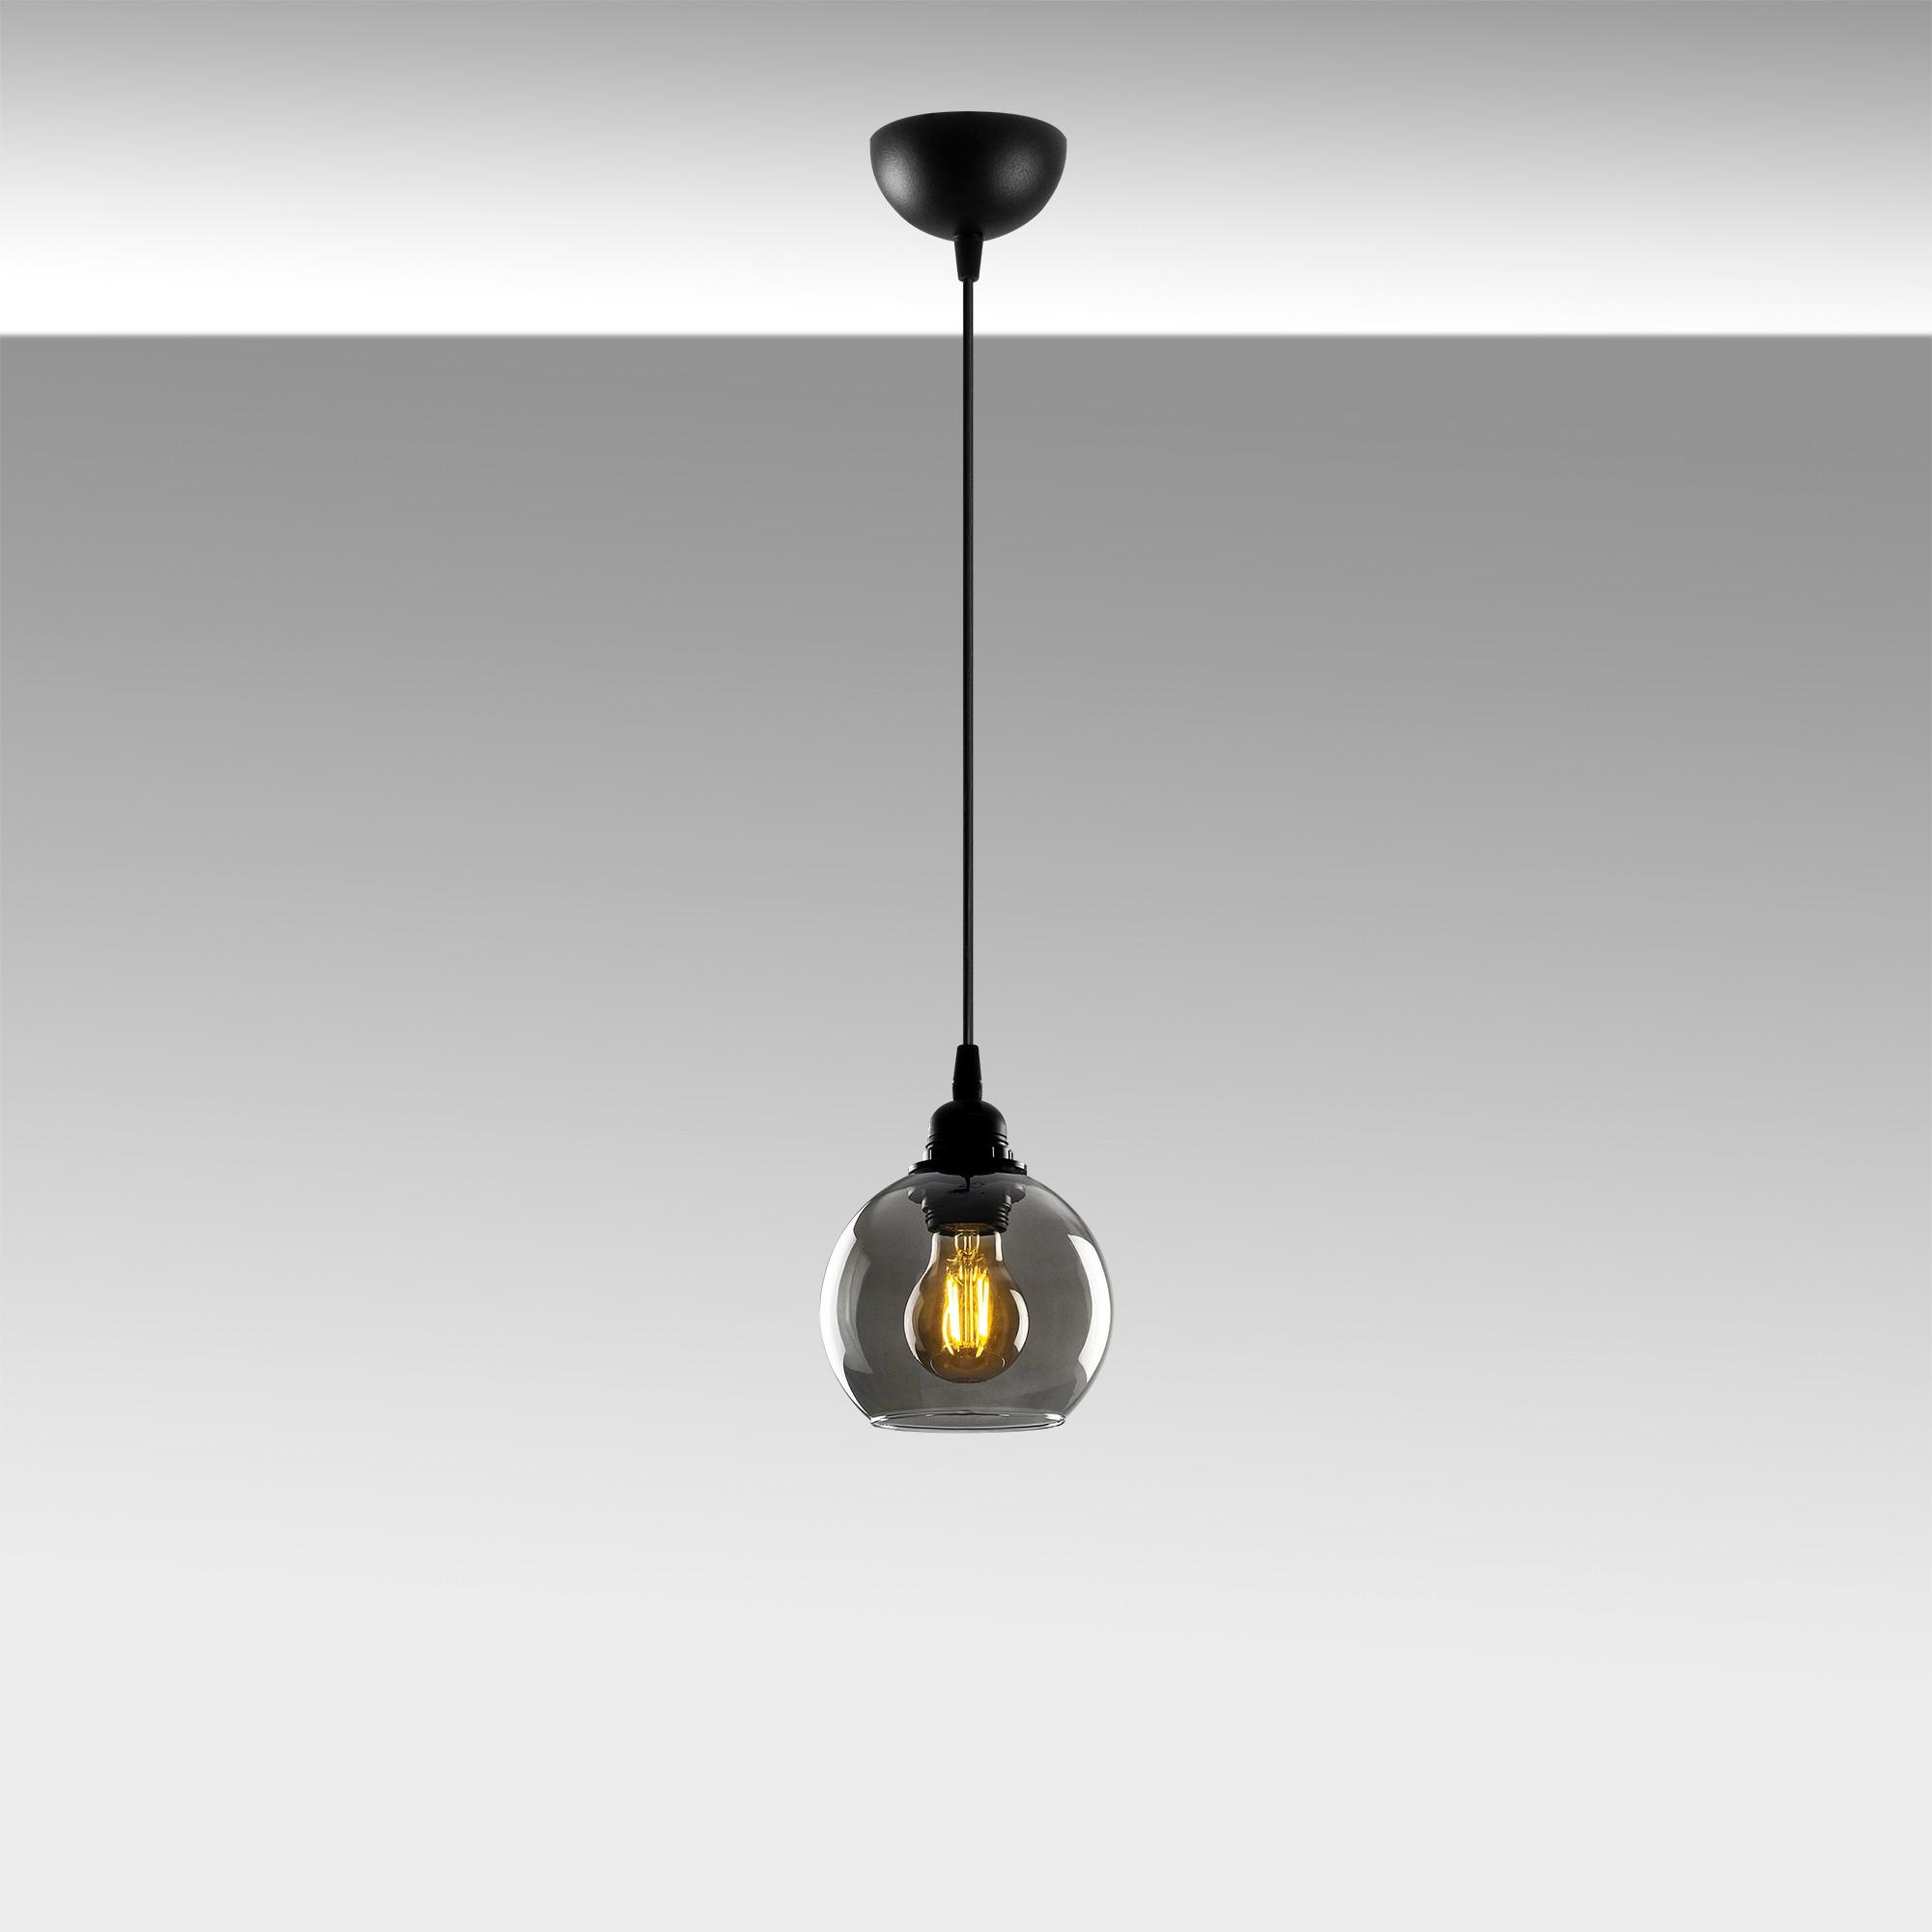 Hanglamp gerookt glas zwart 1 x E27 fitting - sfeerfoto